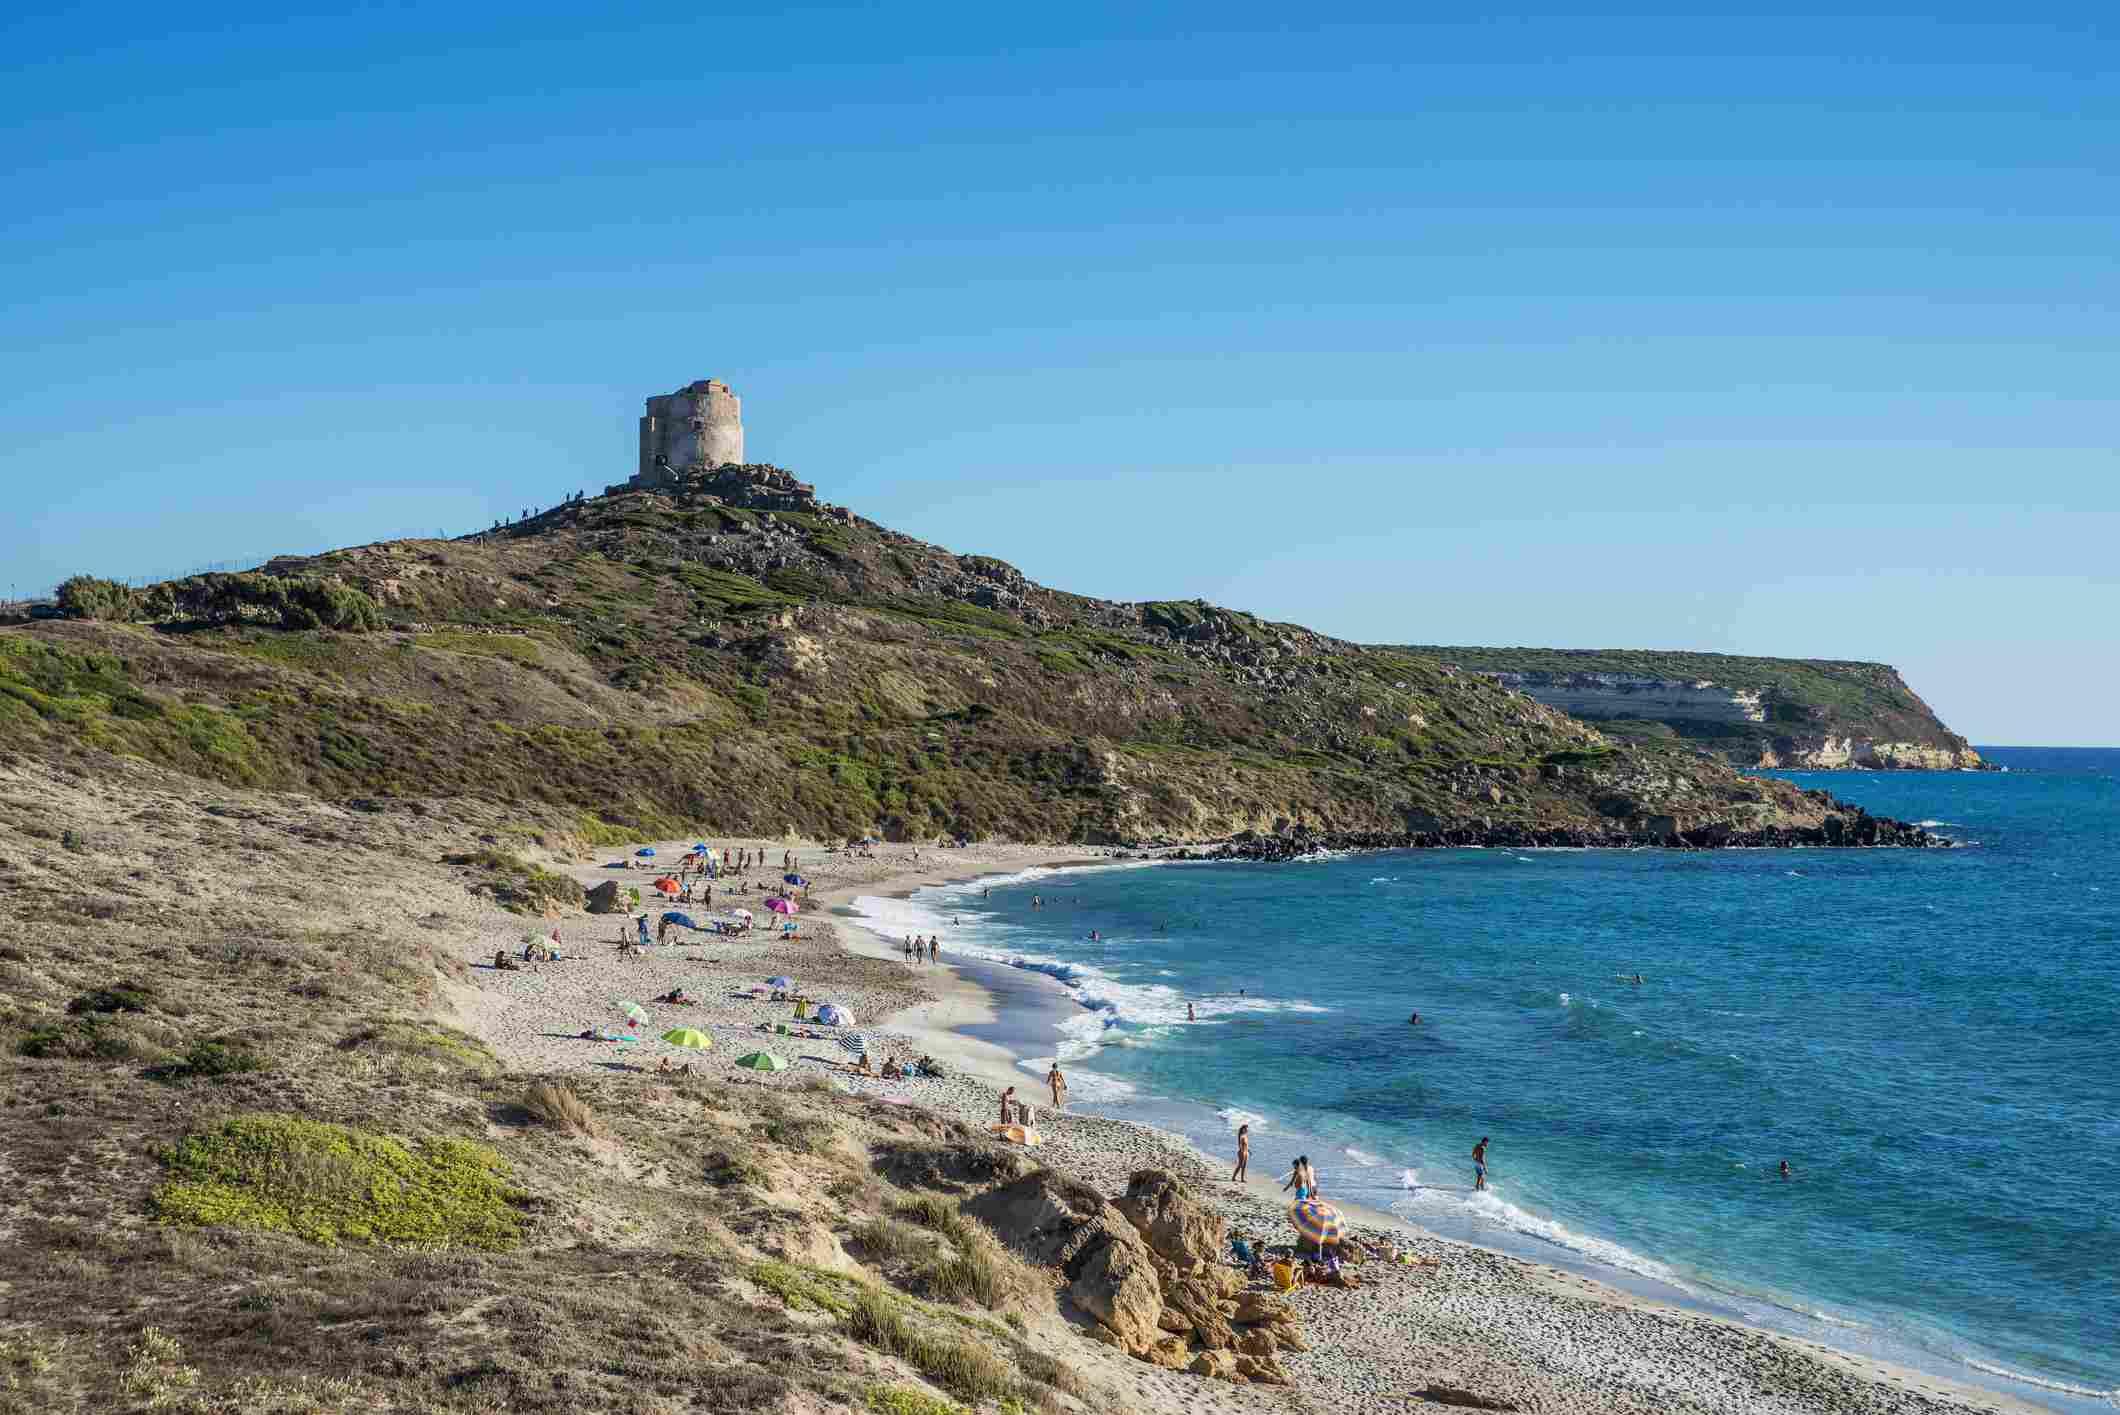 San Giovanni tower and beach